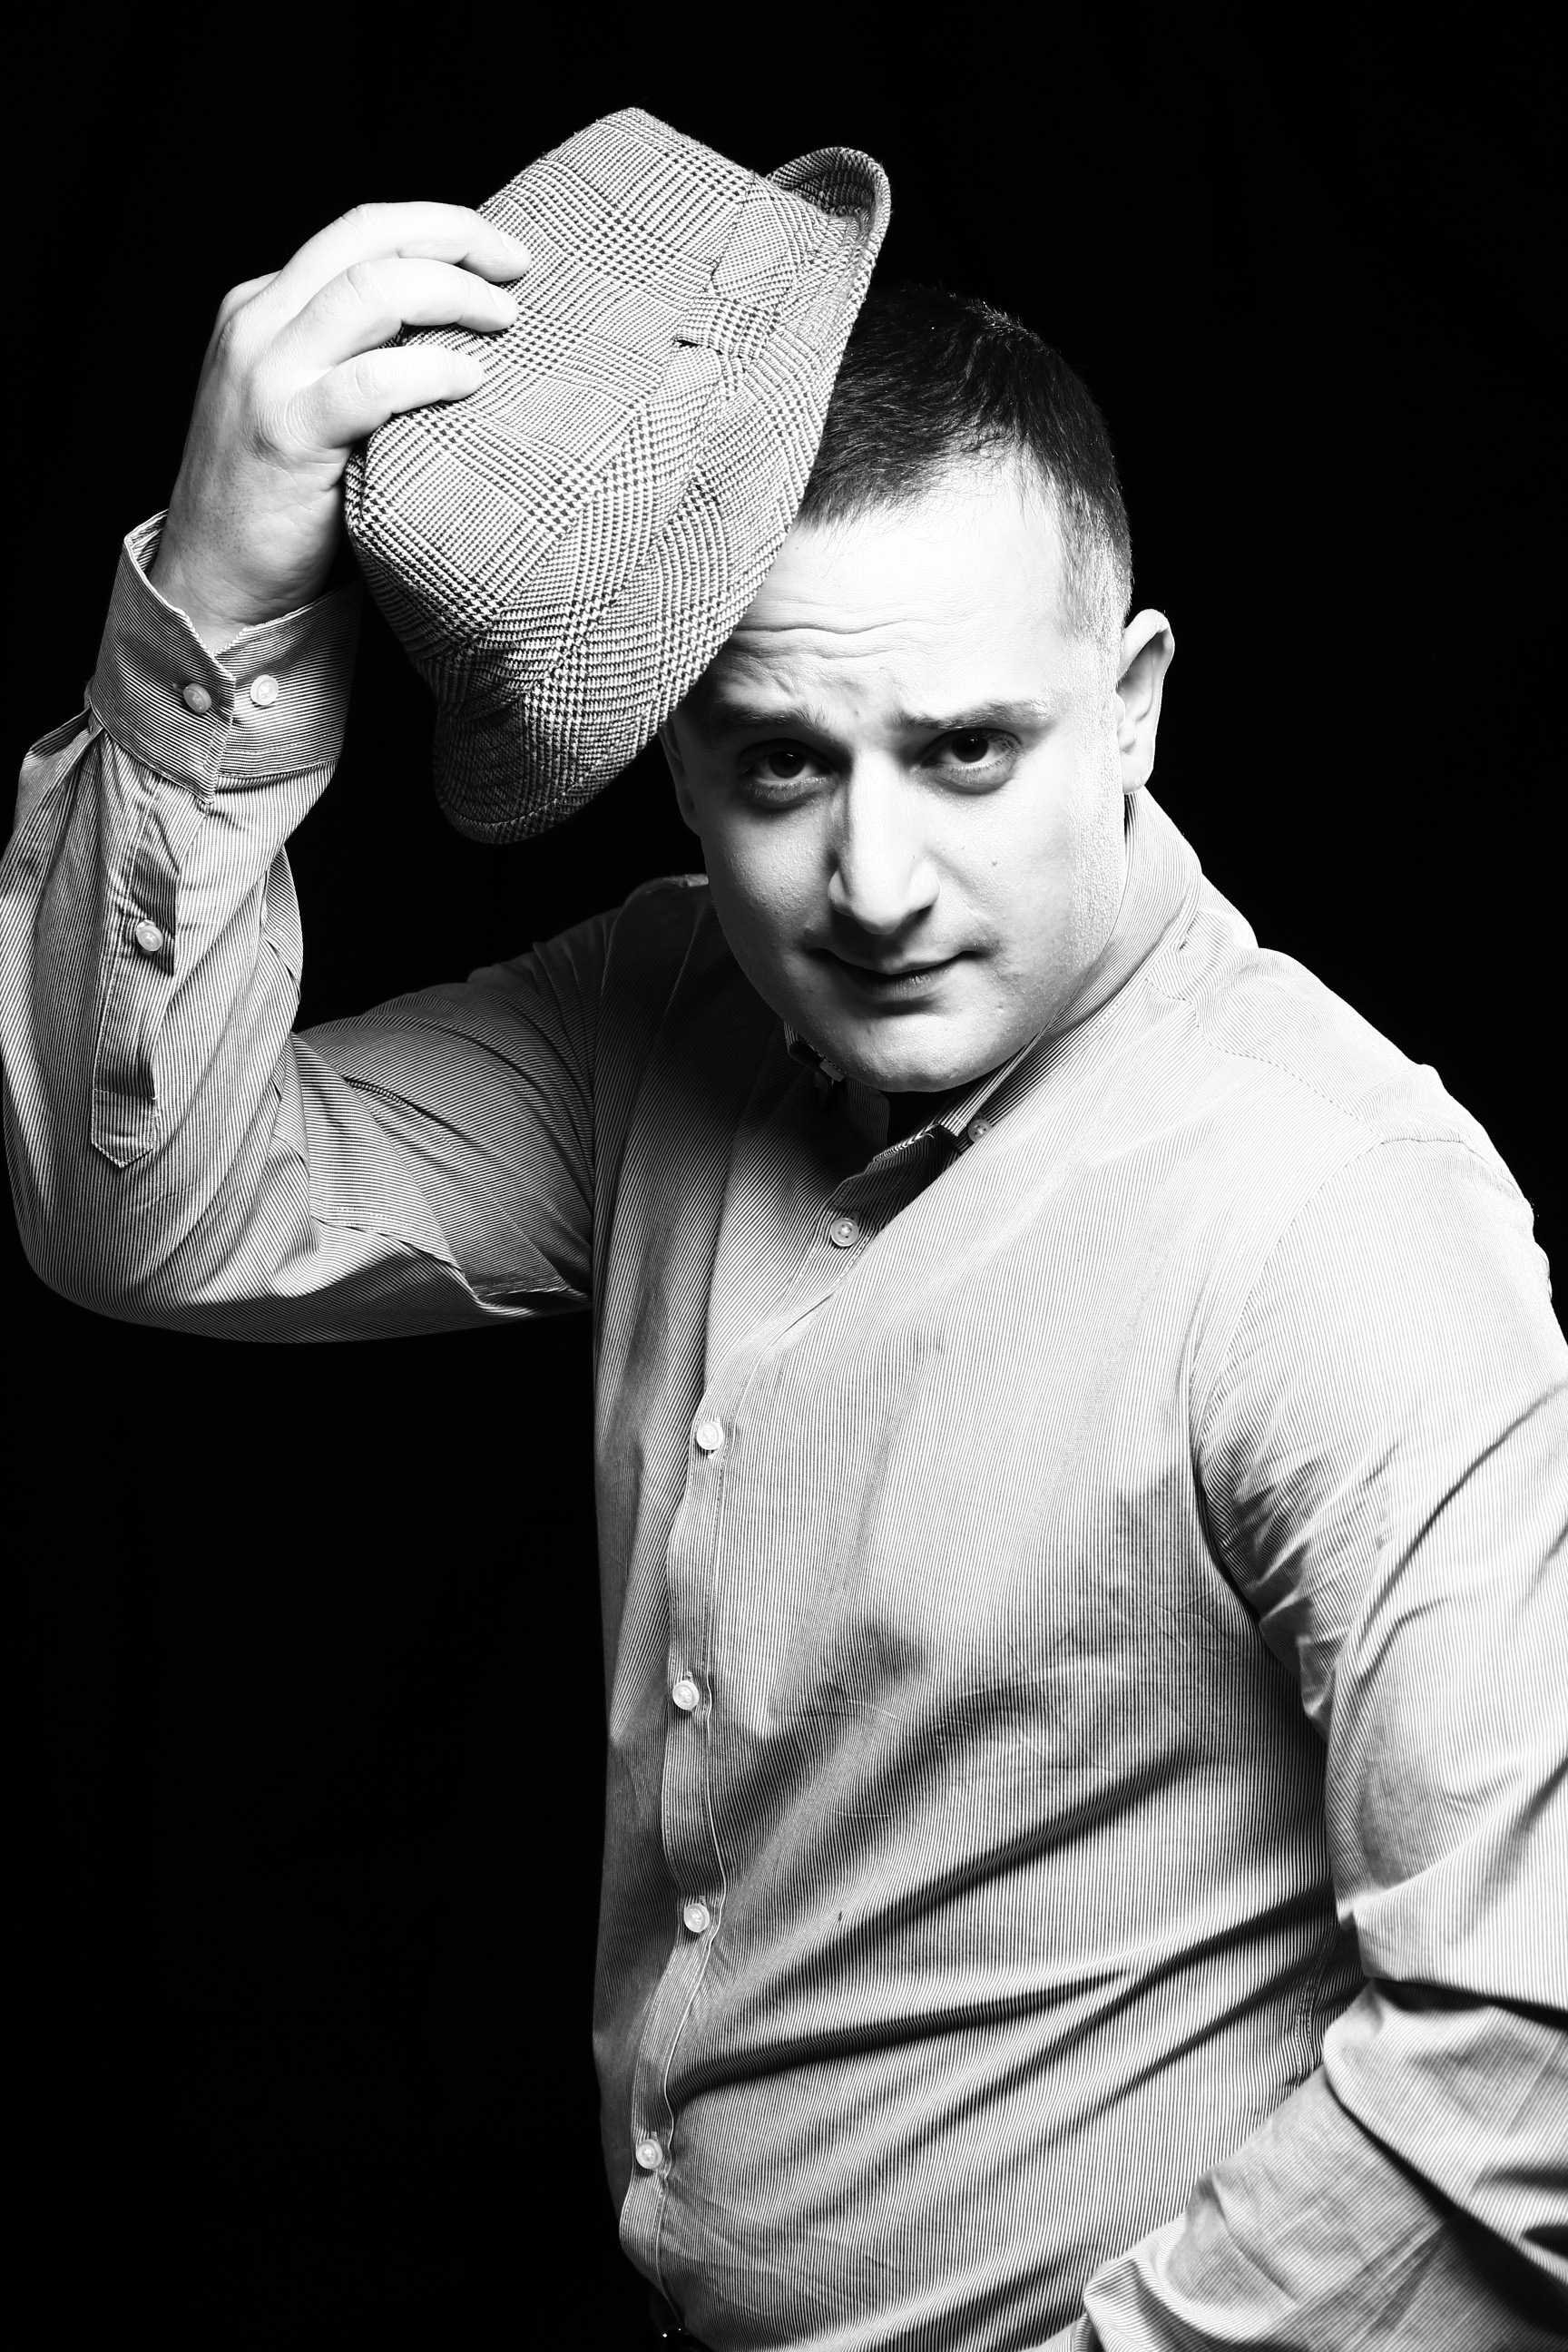 Archil Nijaradze